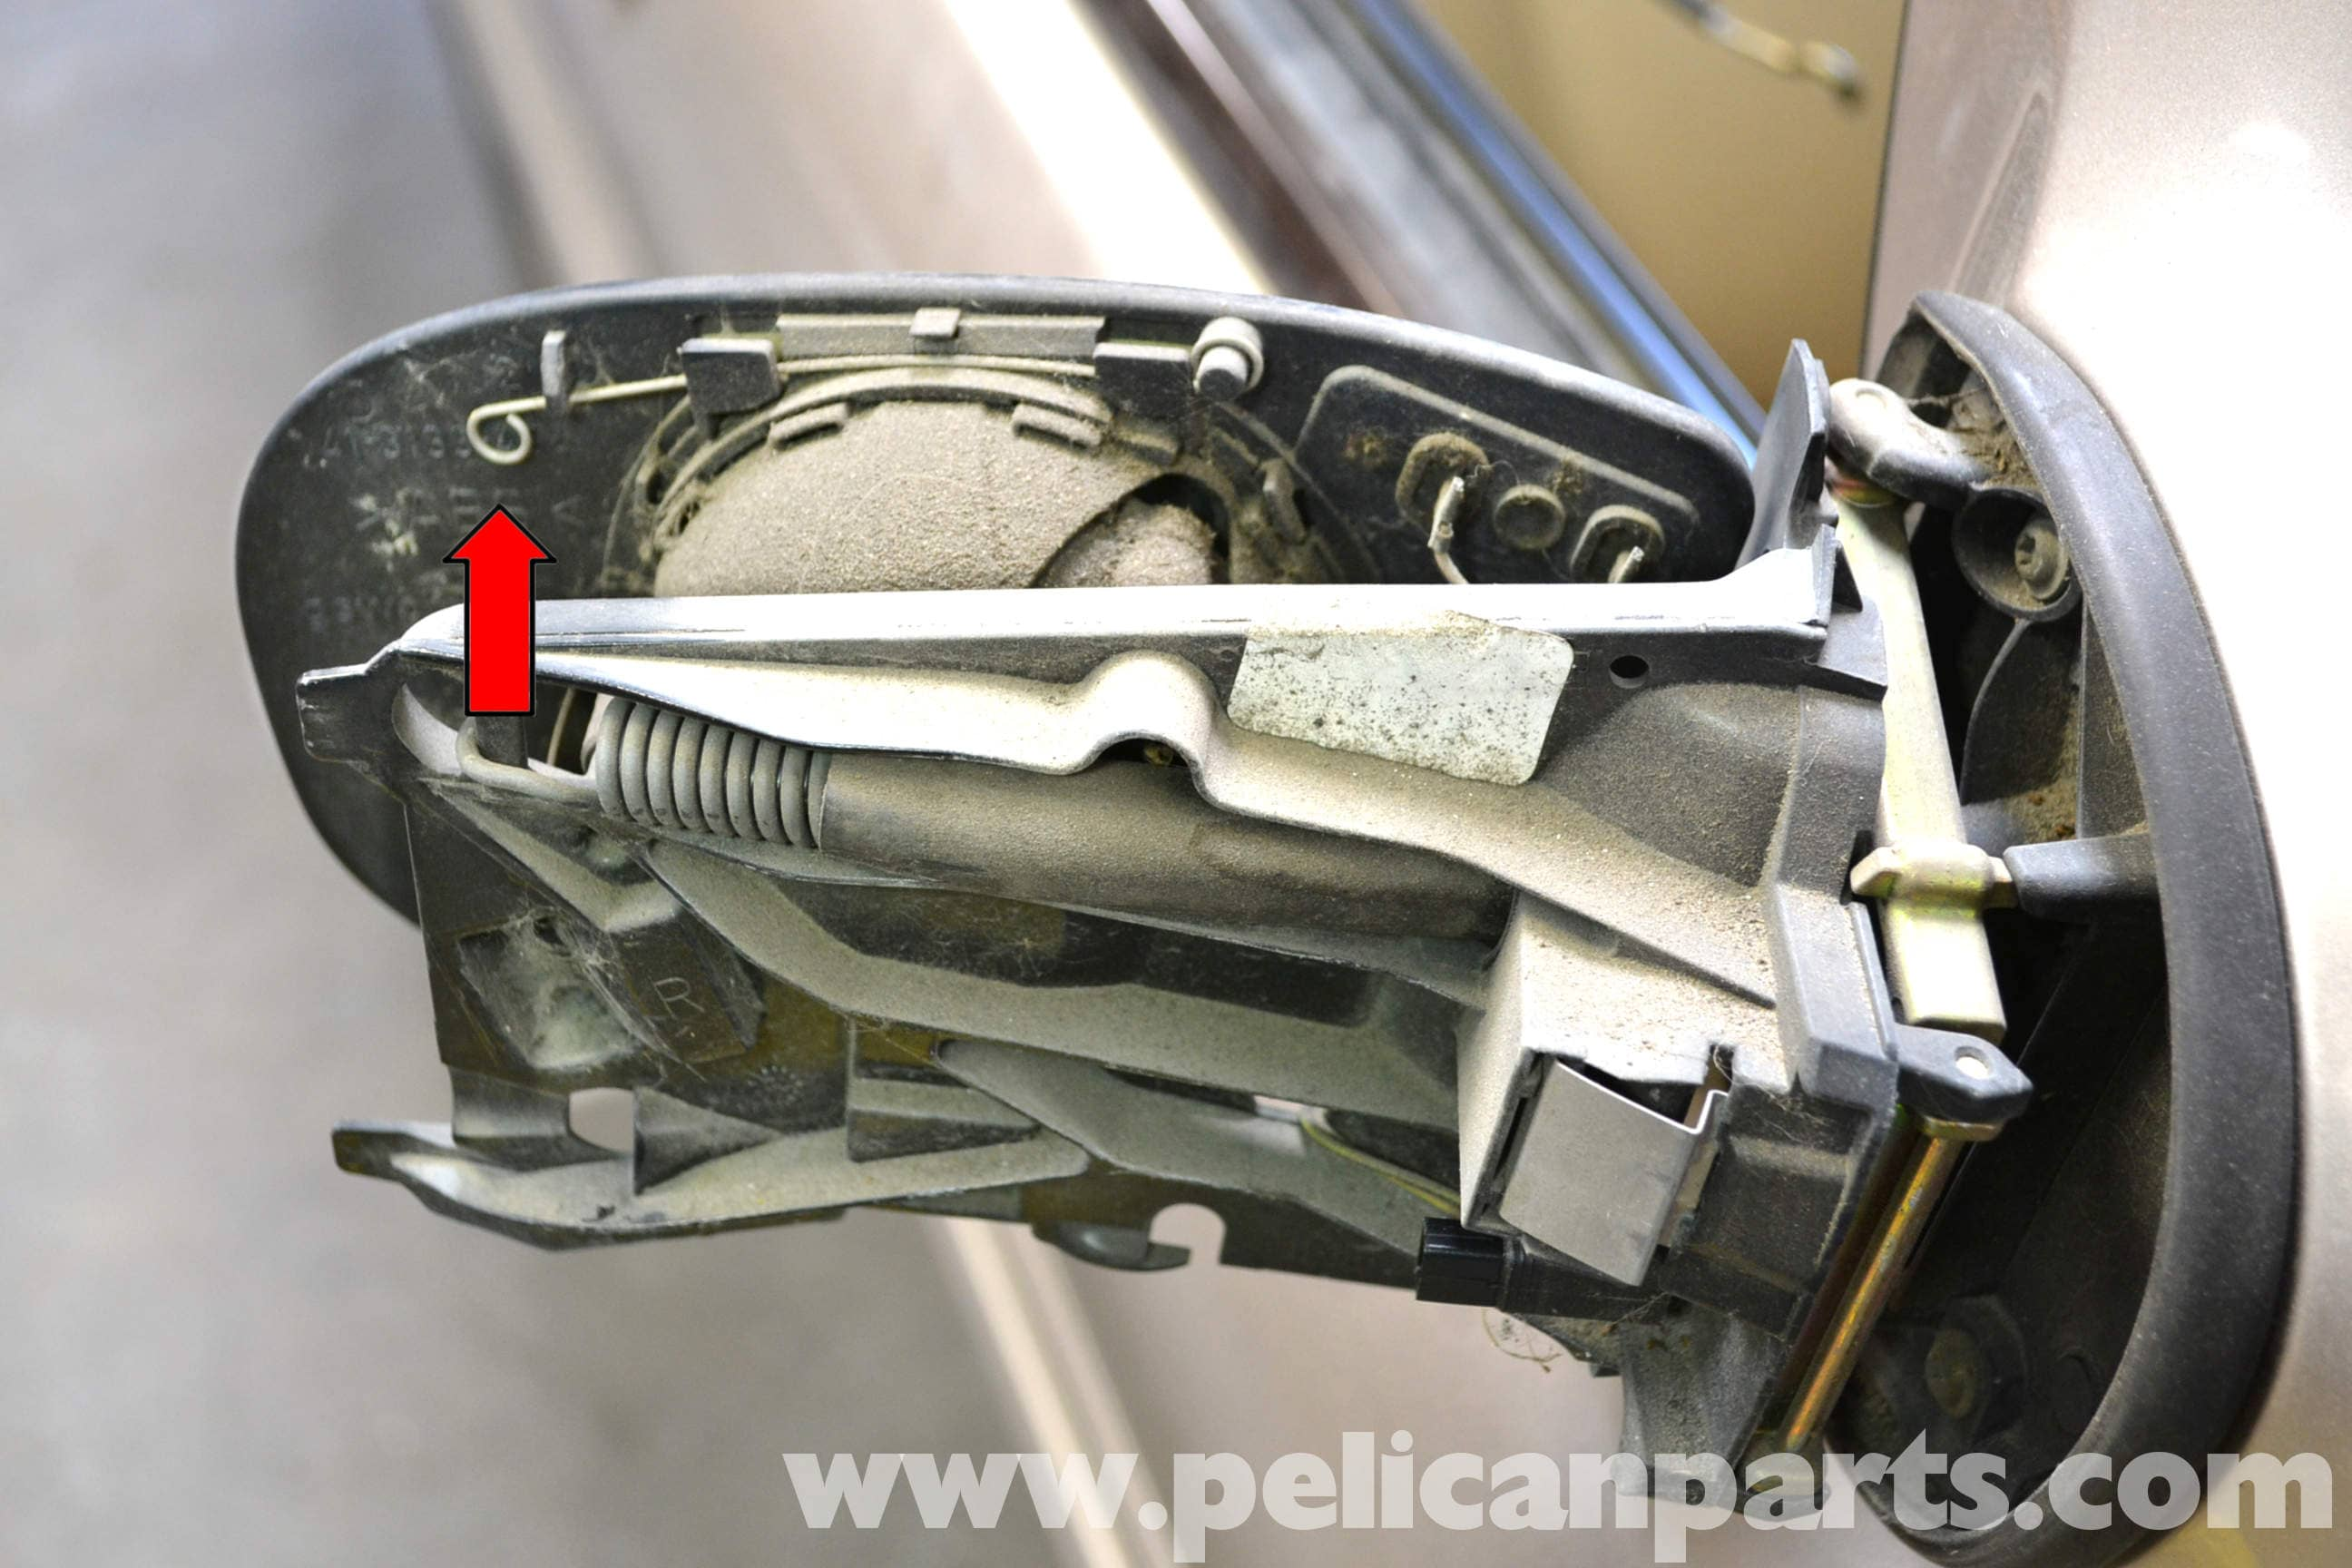 Mercedes-Benz W203 Exterior Mirror Replacement - (2001-2007